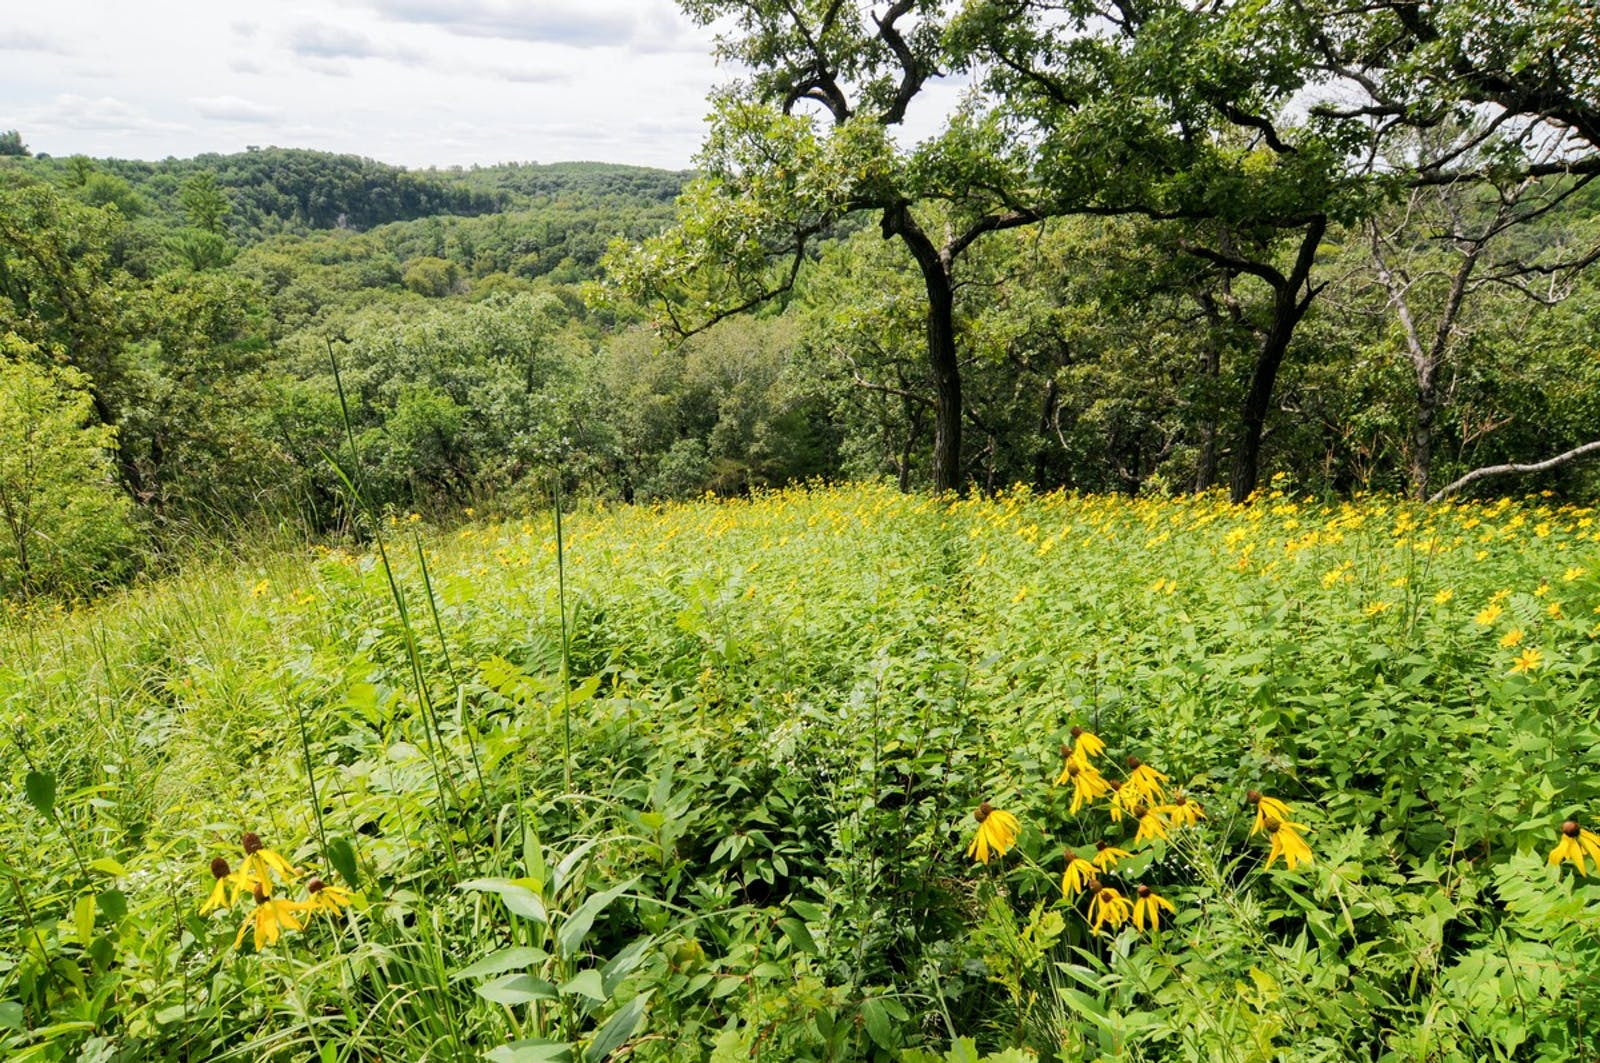 Upper Midwest US Forest-Savanna Transition